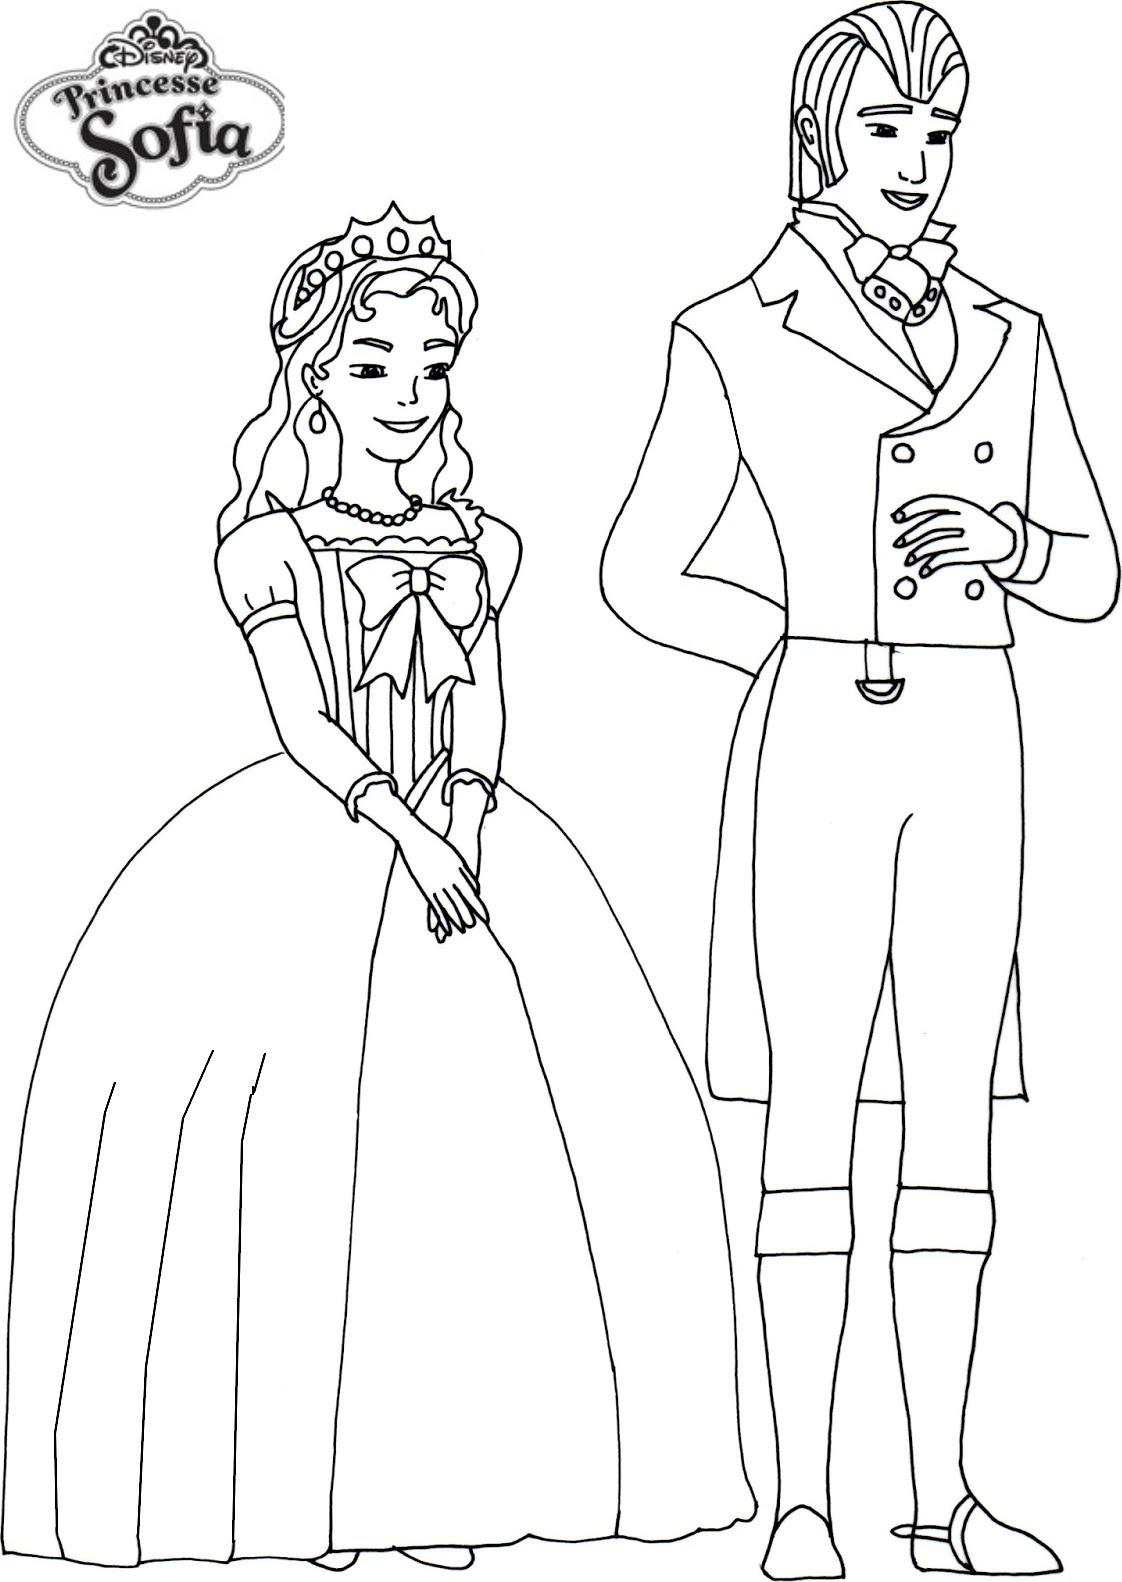 coloriage princesse sofia roi et reine